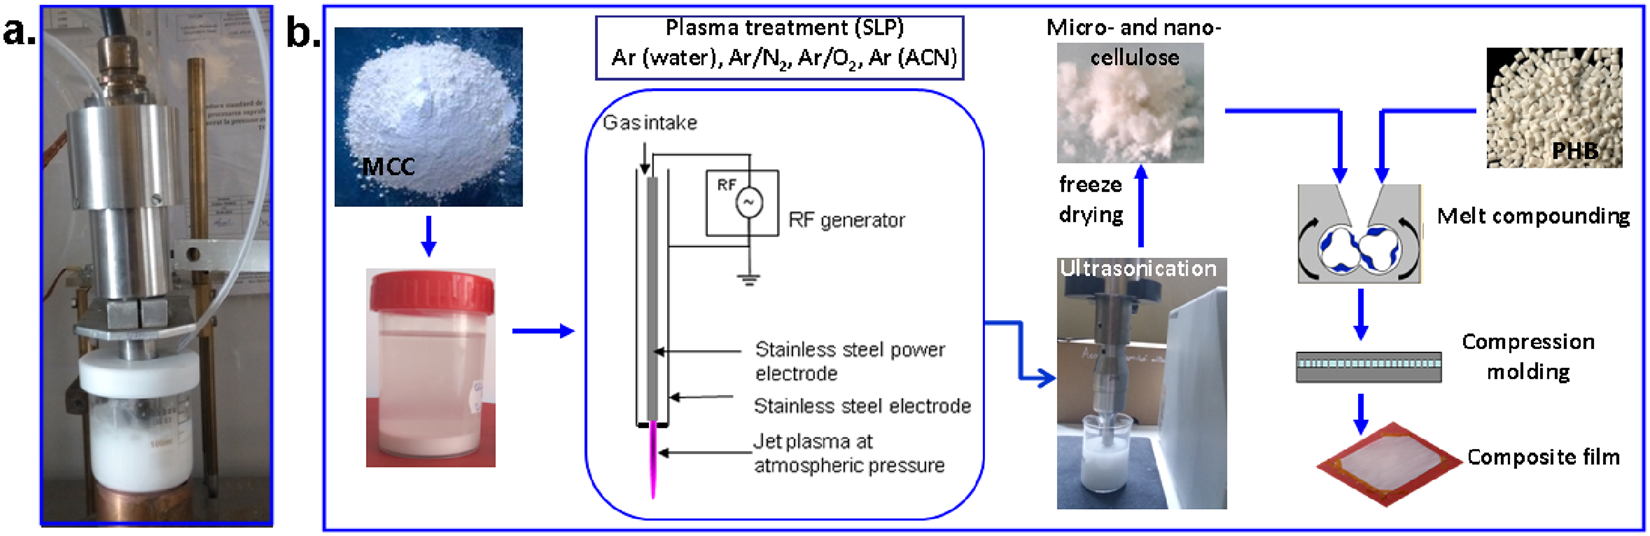 Remarkable Cellulose Defibrillation And Functionalization By Plasma In Liquid Gufa Illuminateatx Wiring Cloud Gufailluminateatxorg